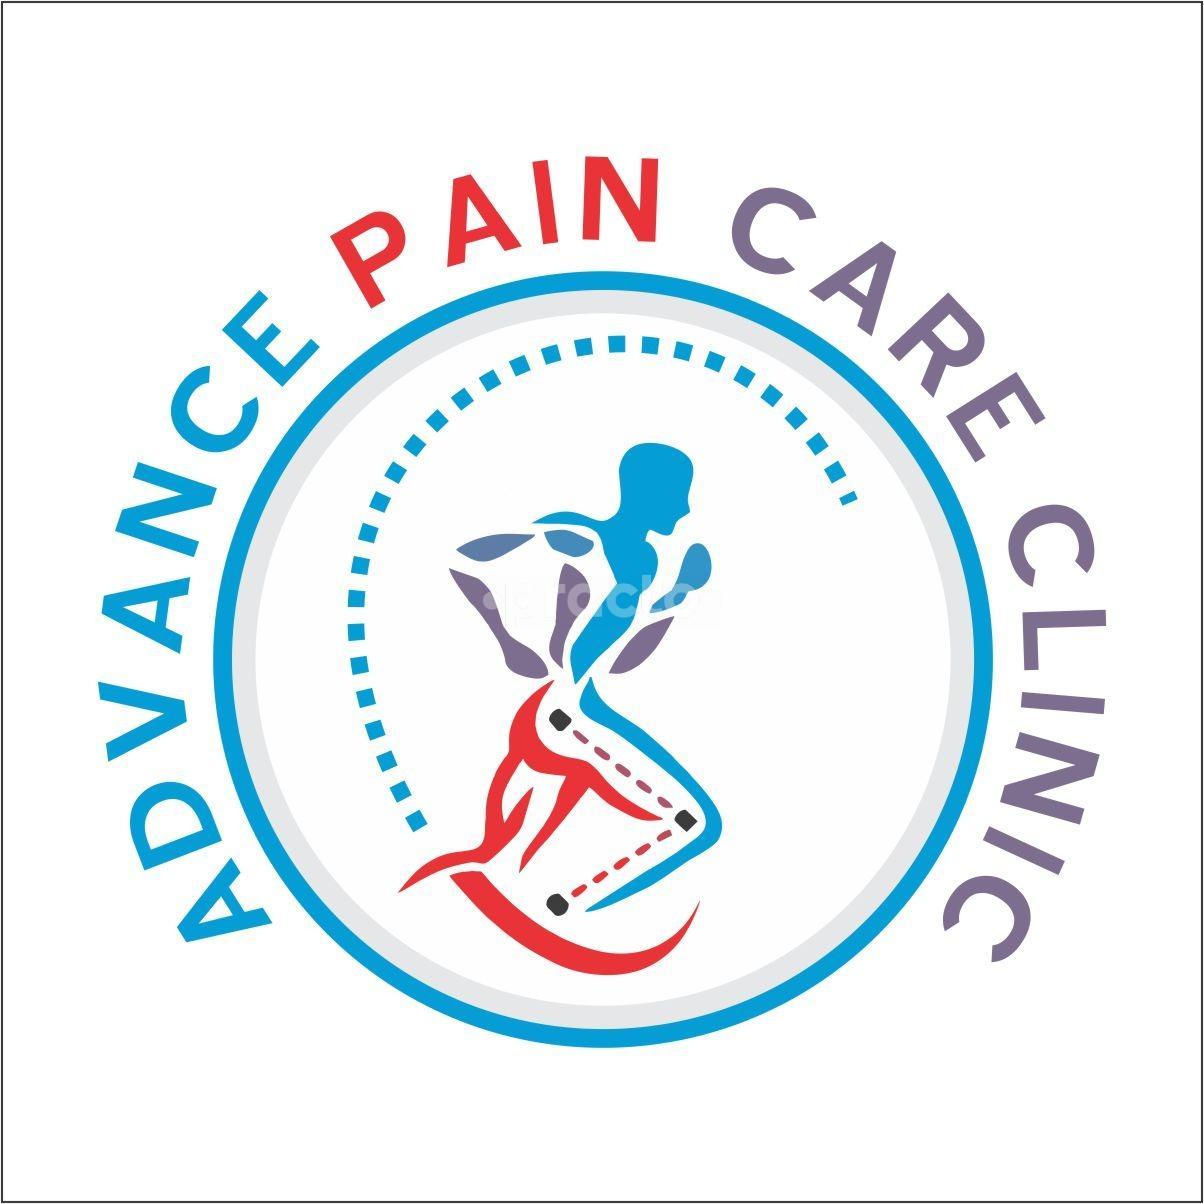 Advance Pain Care Clinic